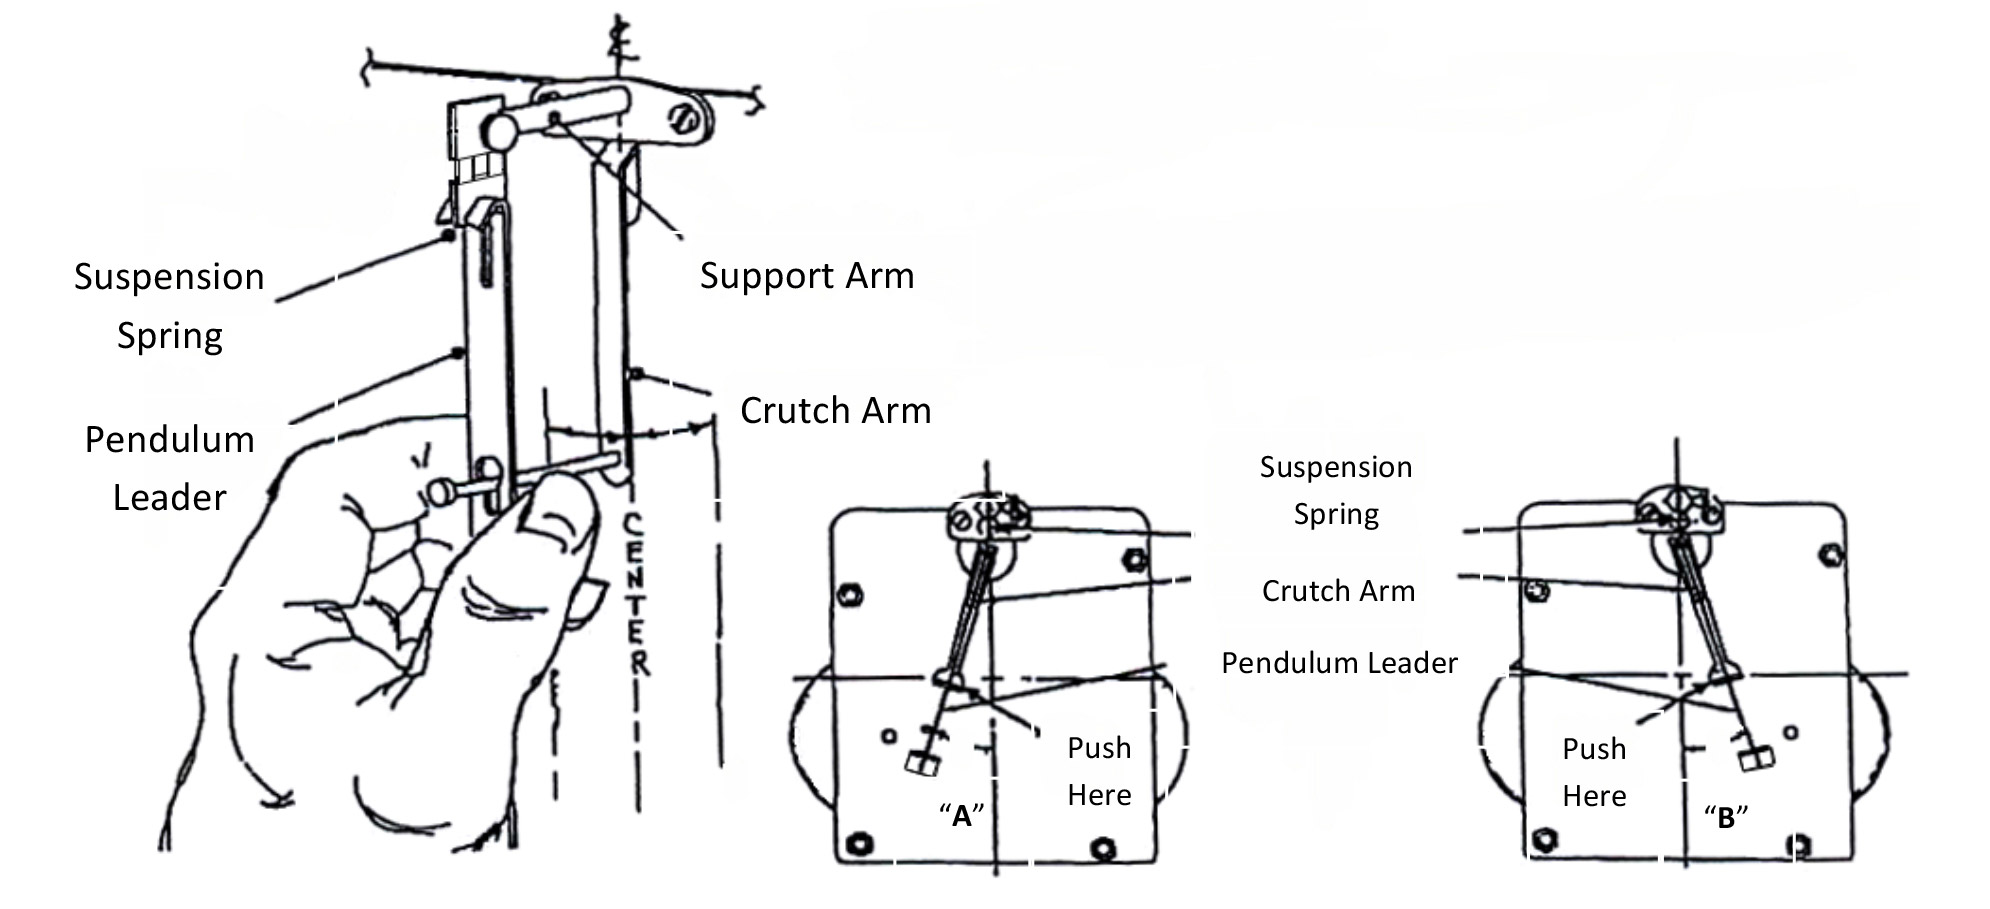 I have a ridgeway model 201, the pendulum won't continue